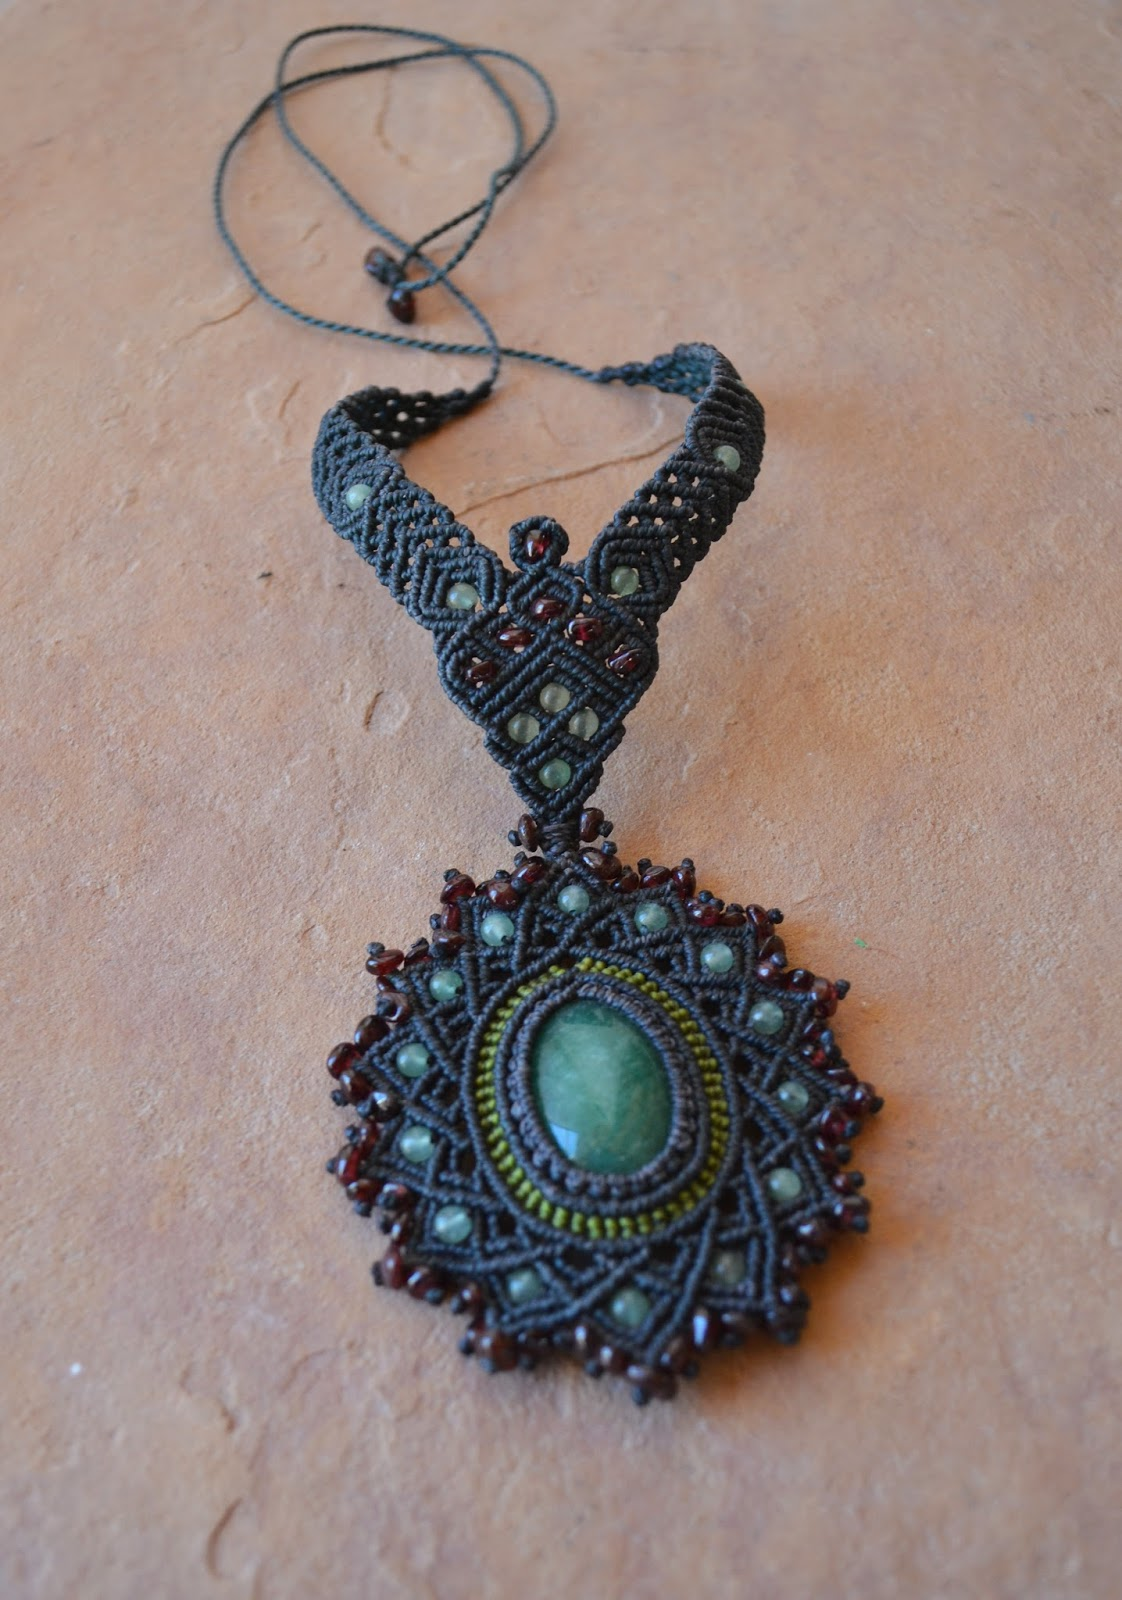 Micromacrame Necklace Aventurine Stone